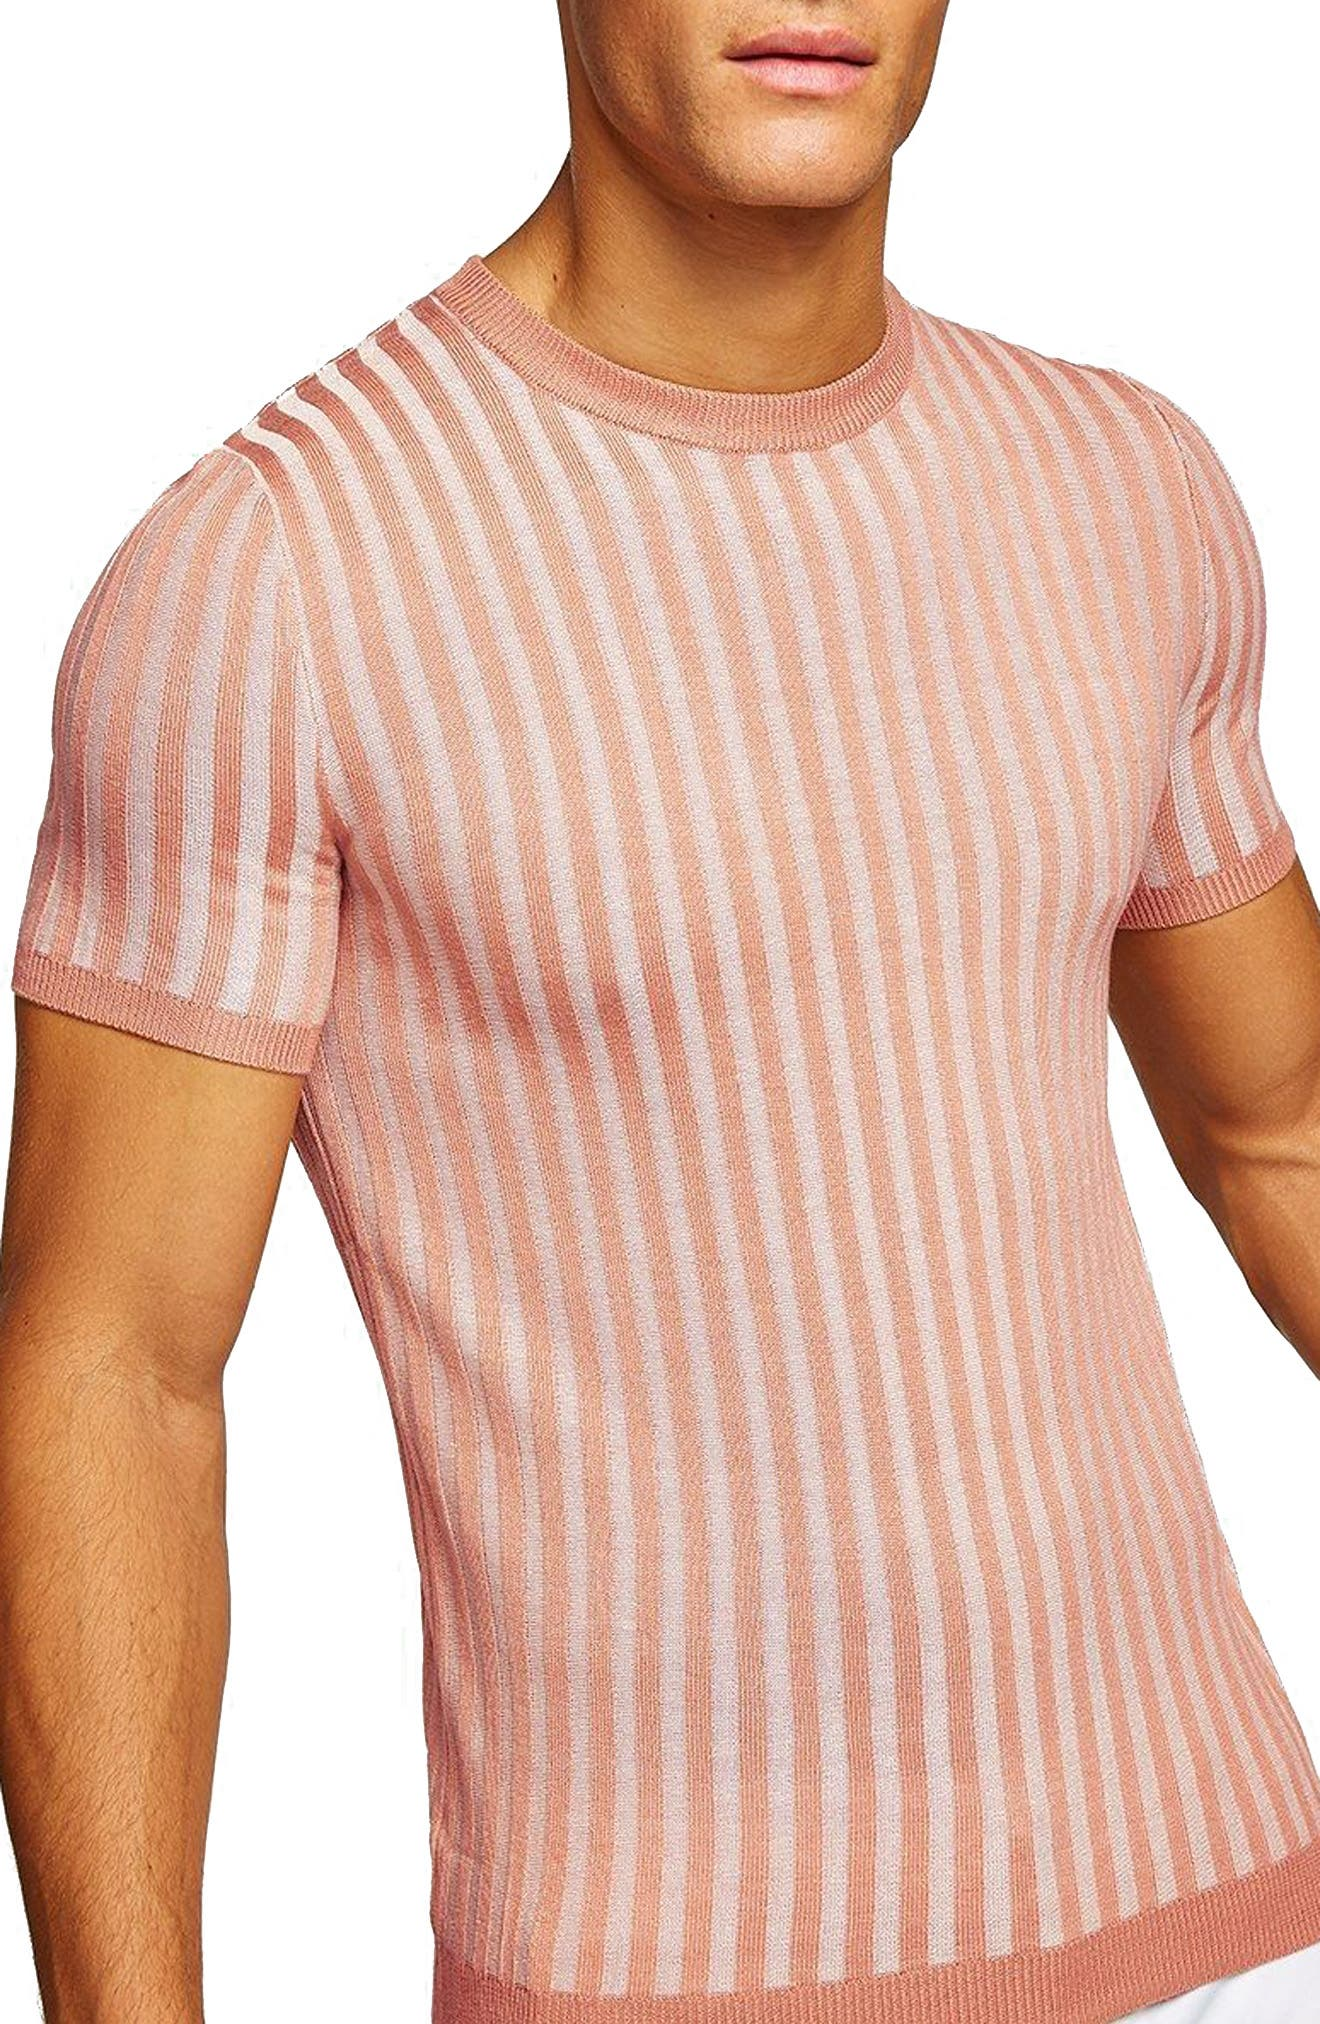 Muscle Fit Ribbed T-Shirt,                             Main thumbnail 1, color,                             650